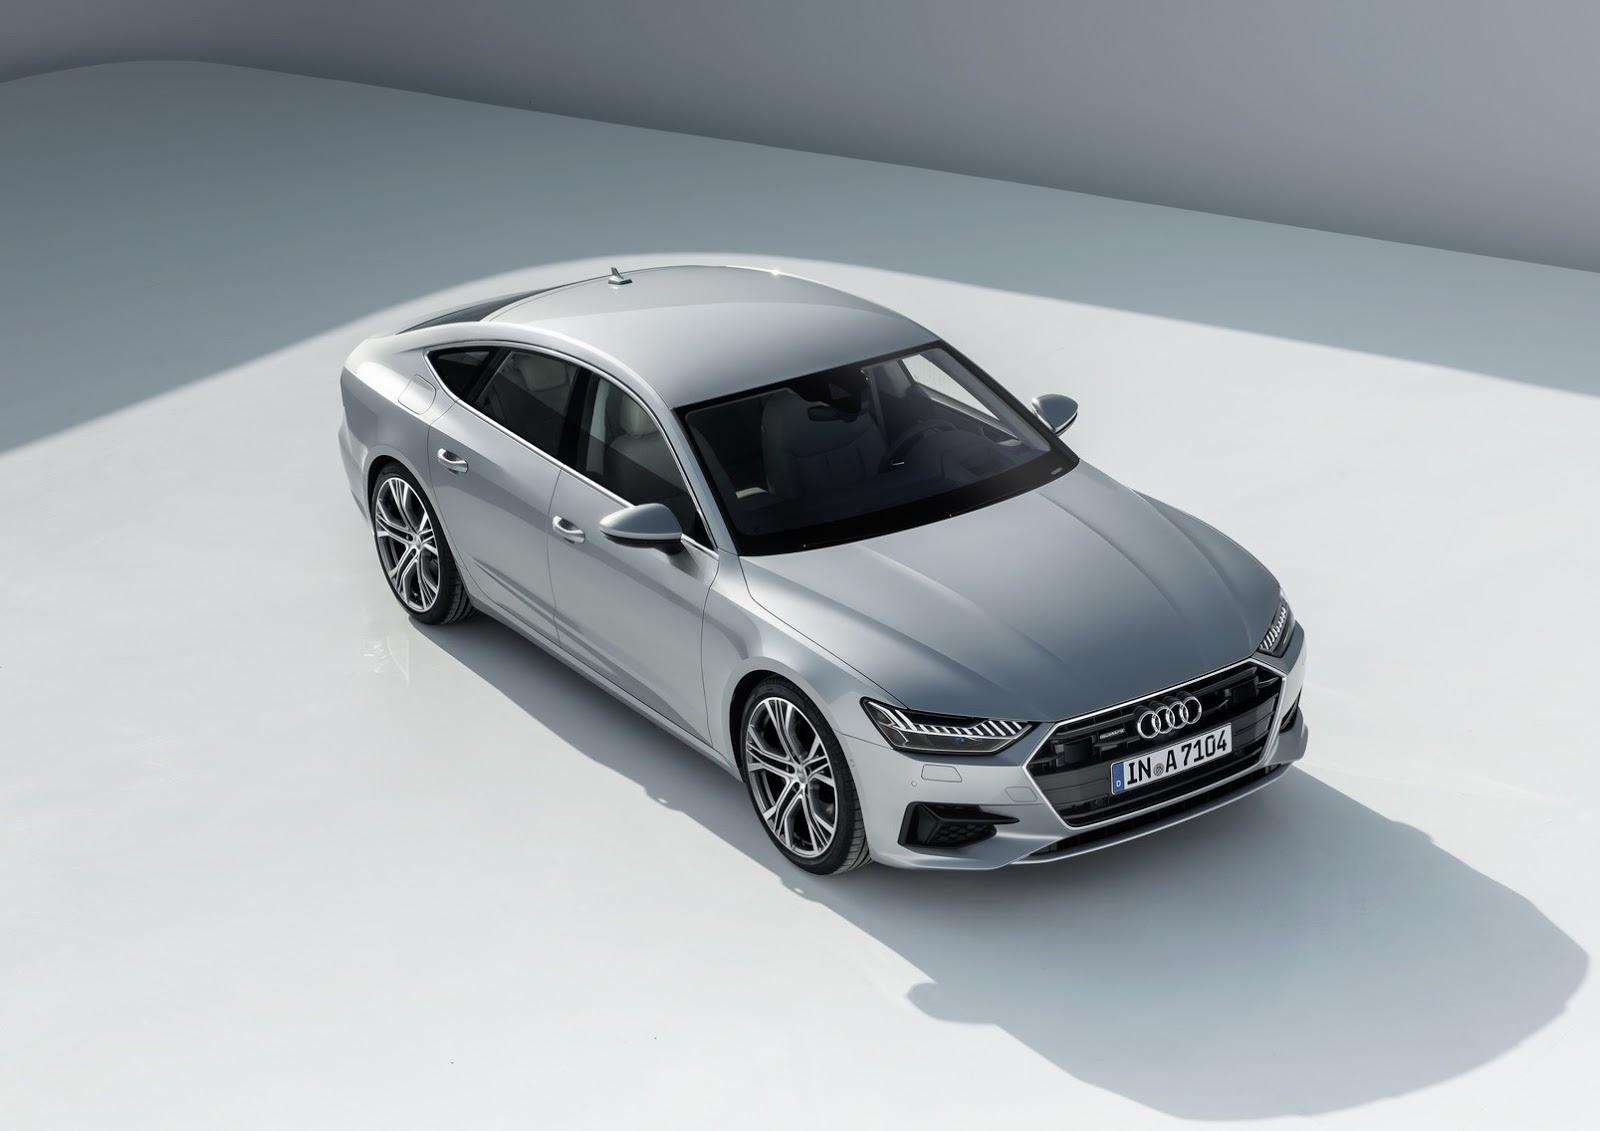 2018_Audi_A7_Sportback_0005